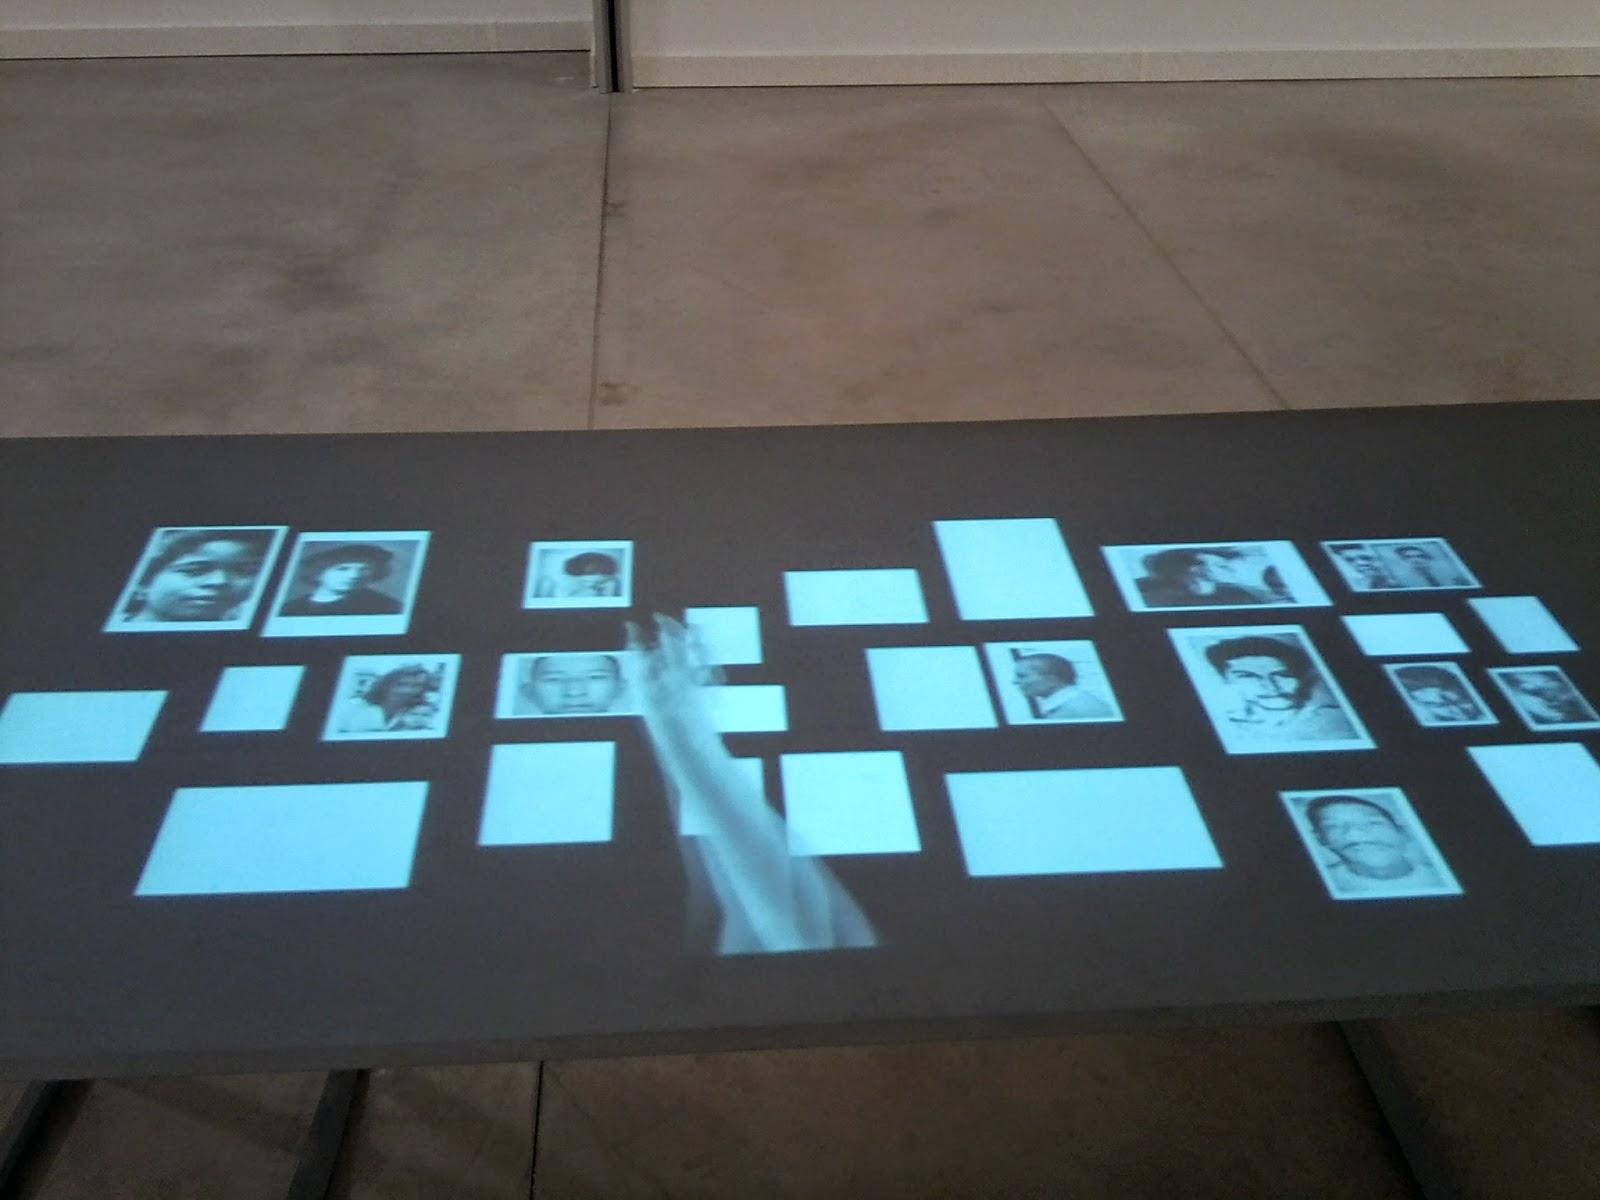 Blog de Arte, Voa-Gallery, Fundación ARCO, Colección, fotografía, Centro de Arte Alcobendas, Exposición temporal, Variation, Instalación, Oscar Muñoz,